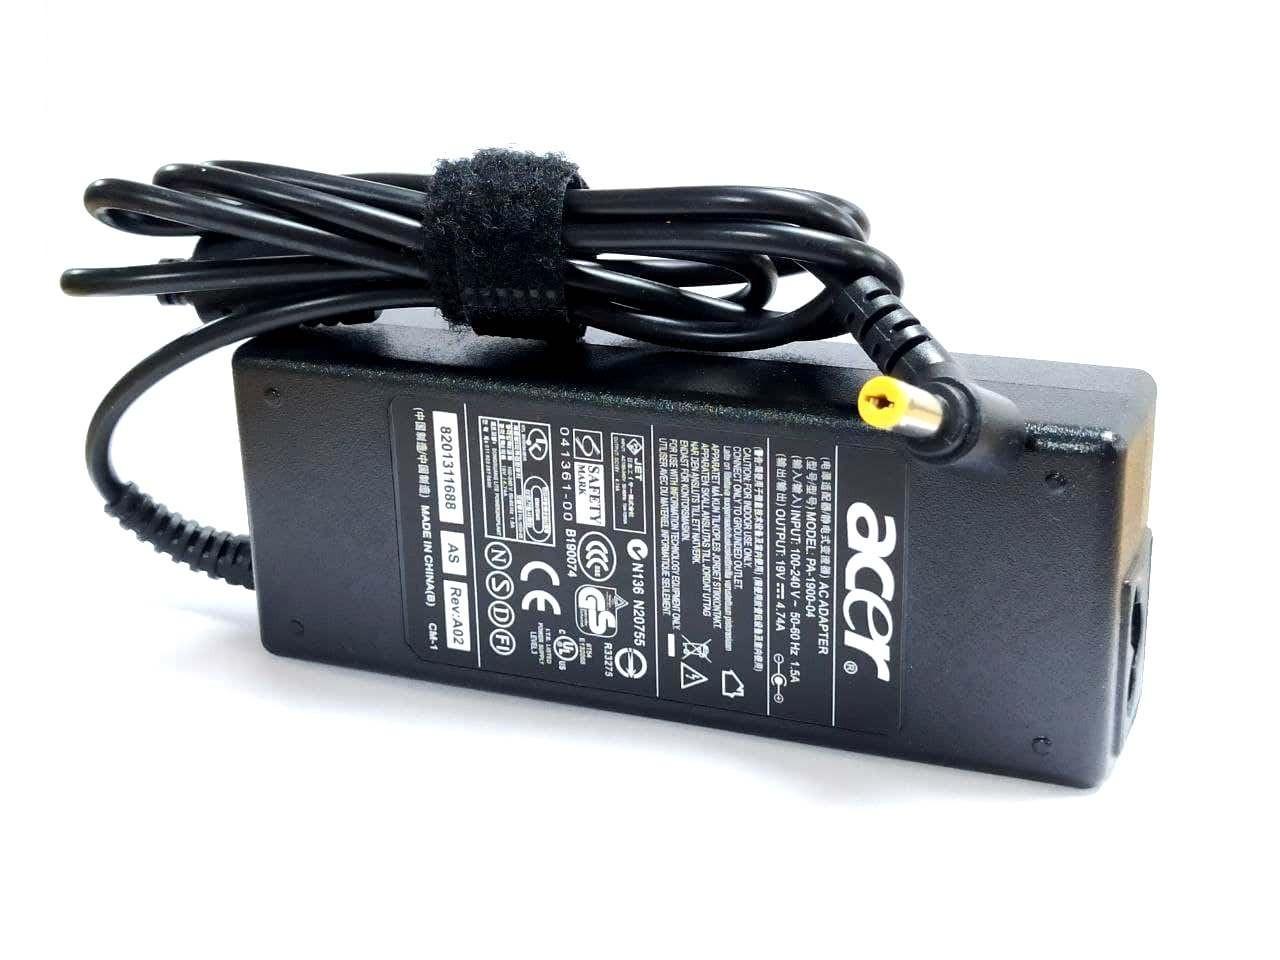 Блок питания для ноутбука Acer Aspire V5-472PG 19V 4.74A 90W